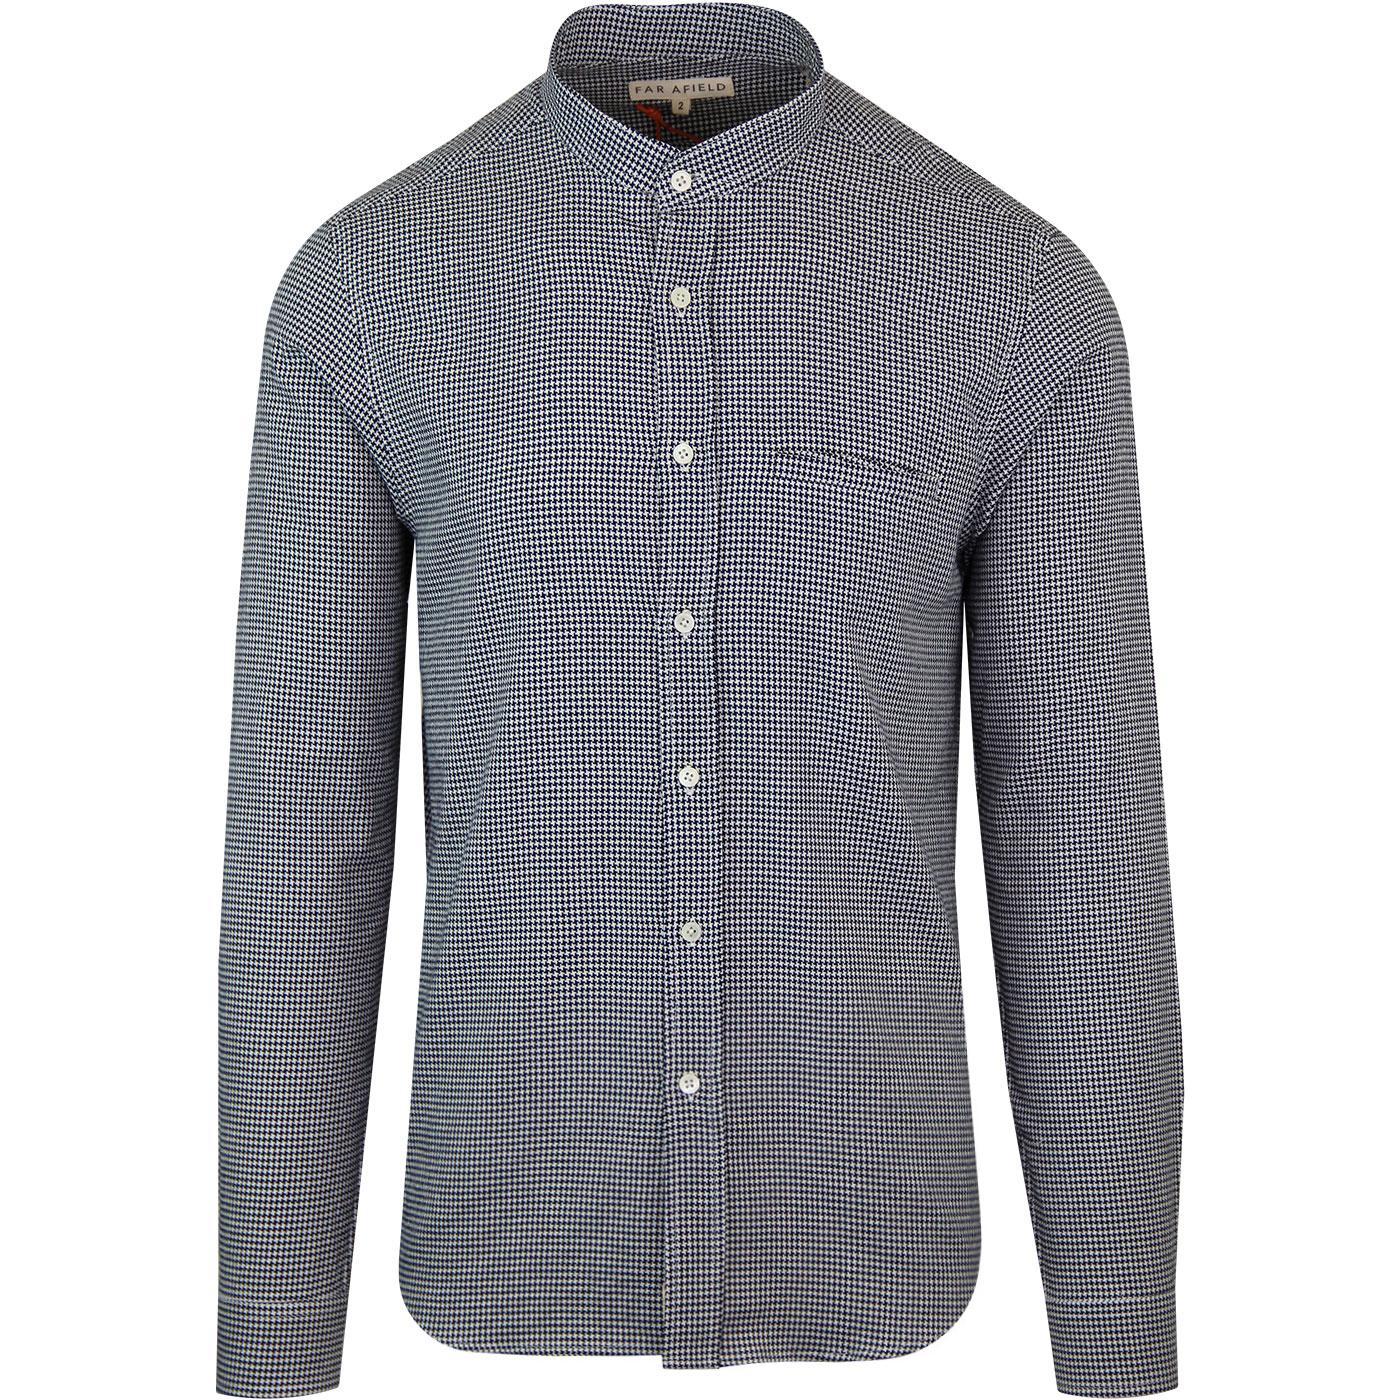 Twombly FAR AFIELD 60s Mod Dogtooth Granddad Shirt